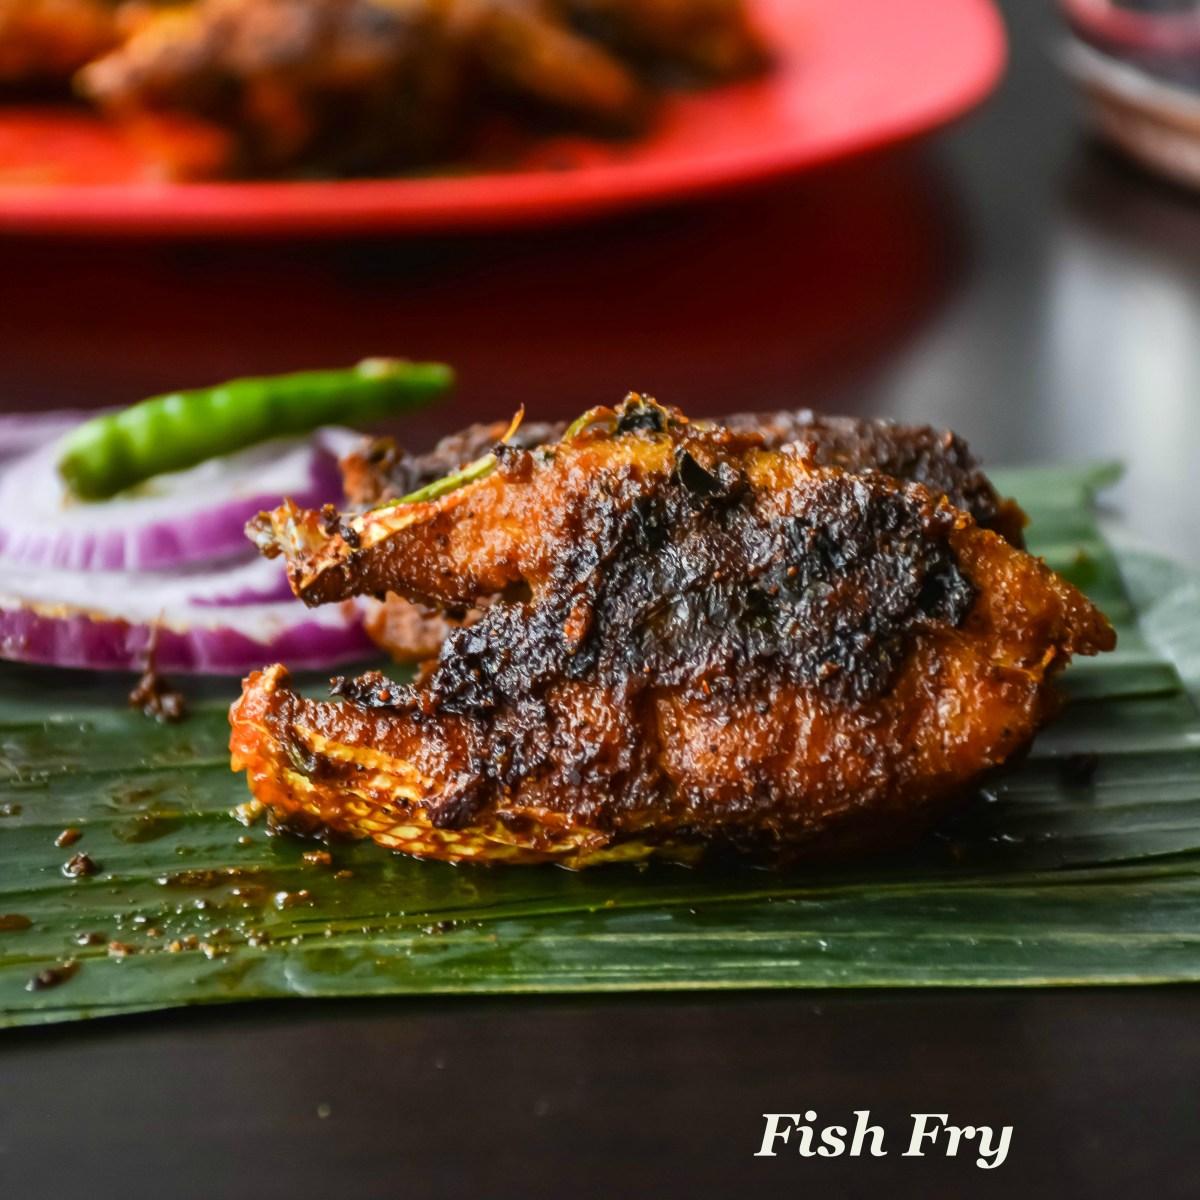 Fish Fry Relish The Bite